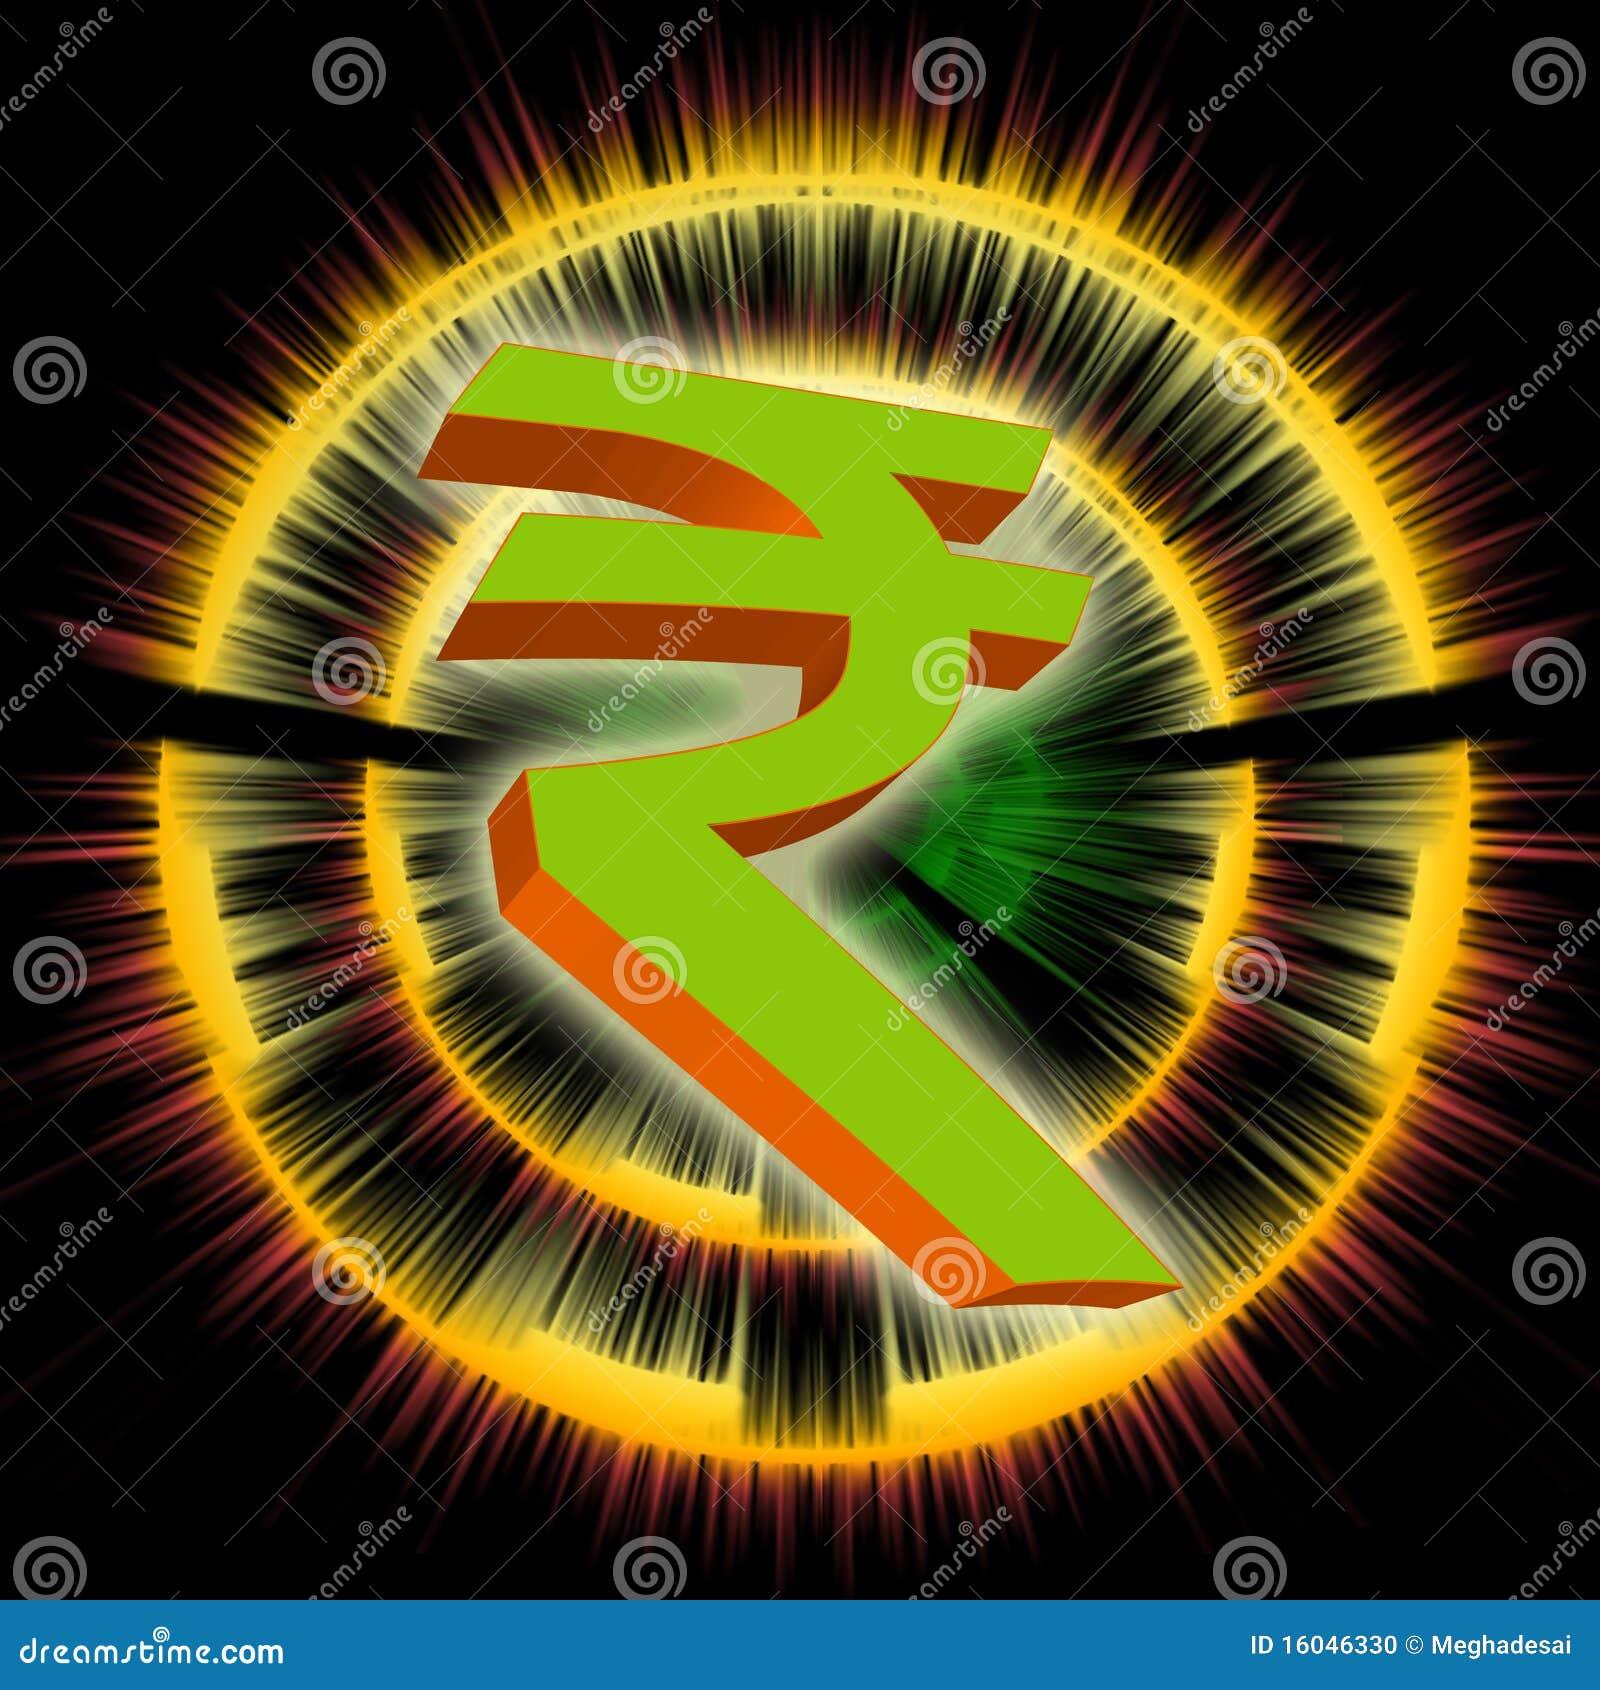 Indian rupee symbol stock illustration illustration of orange indian rupee symbol biocorpaavc Choice Image